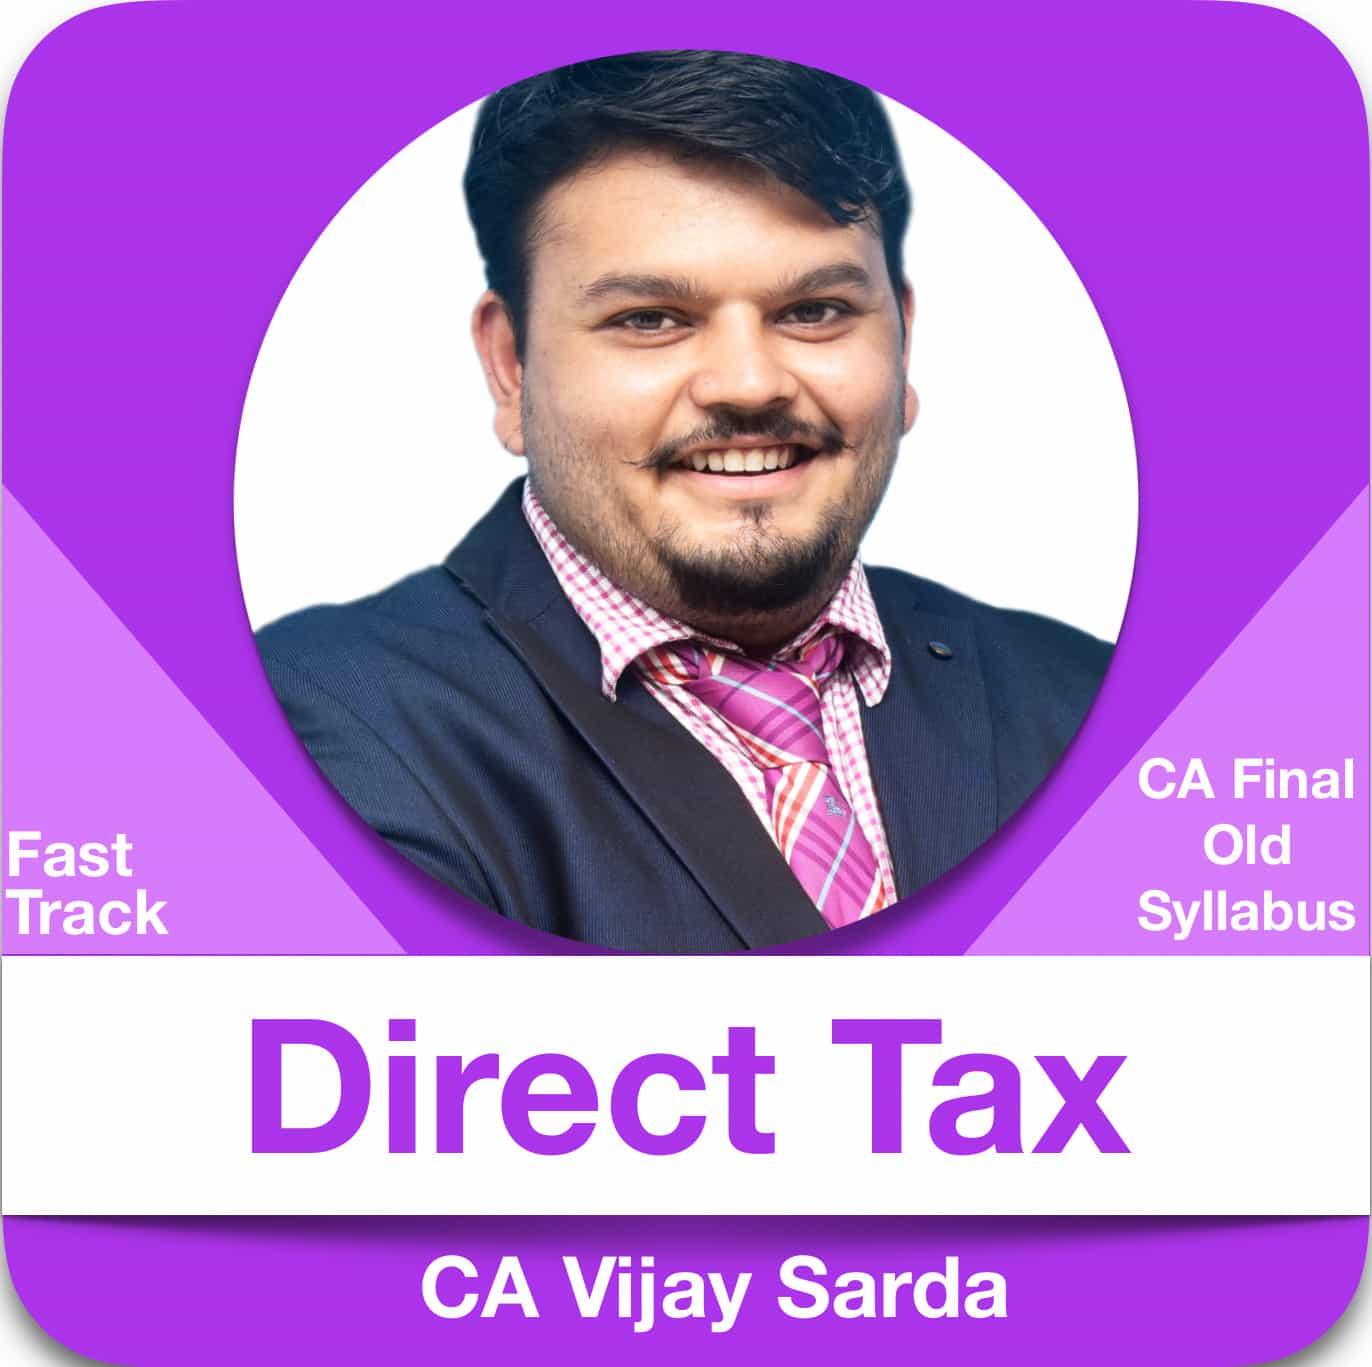 CA Final Direct Tax Laws Fast Track Batch Old Syllabus by CA Vijay Sarda